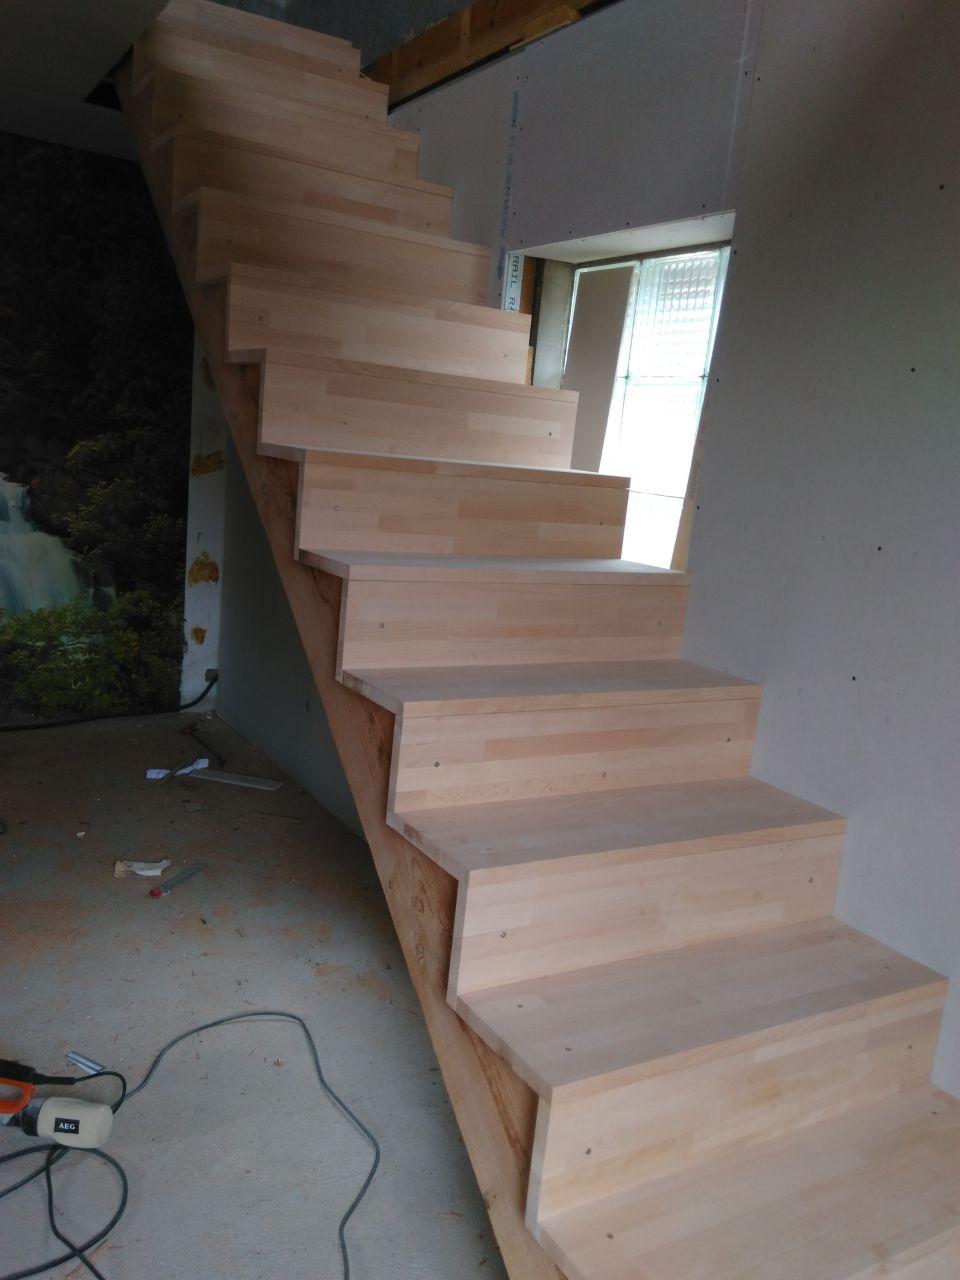 l'escalier posé  il est beauuuuuuuuuu